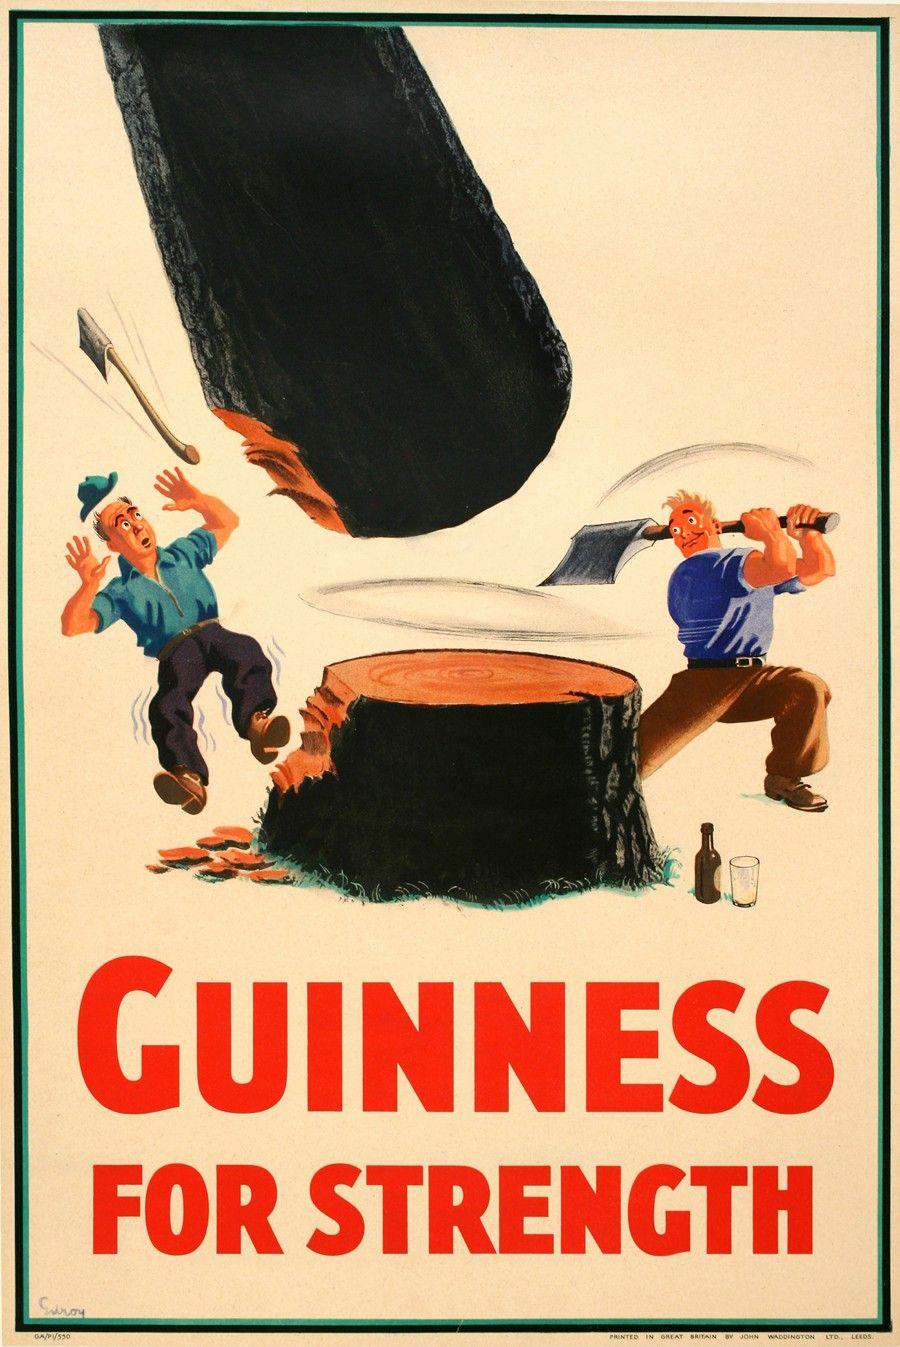 GUINNESS FOR STRENGTH - LUMBERJACKS by GILROY | Posters | Pinterest ...